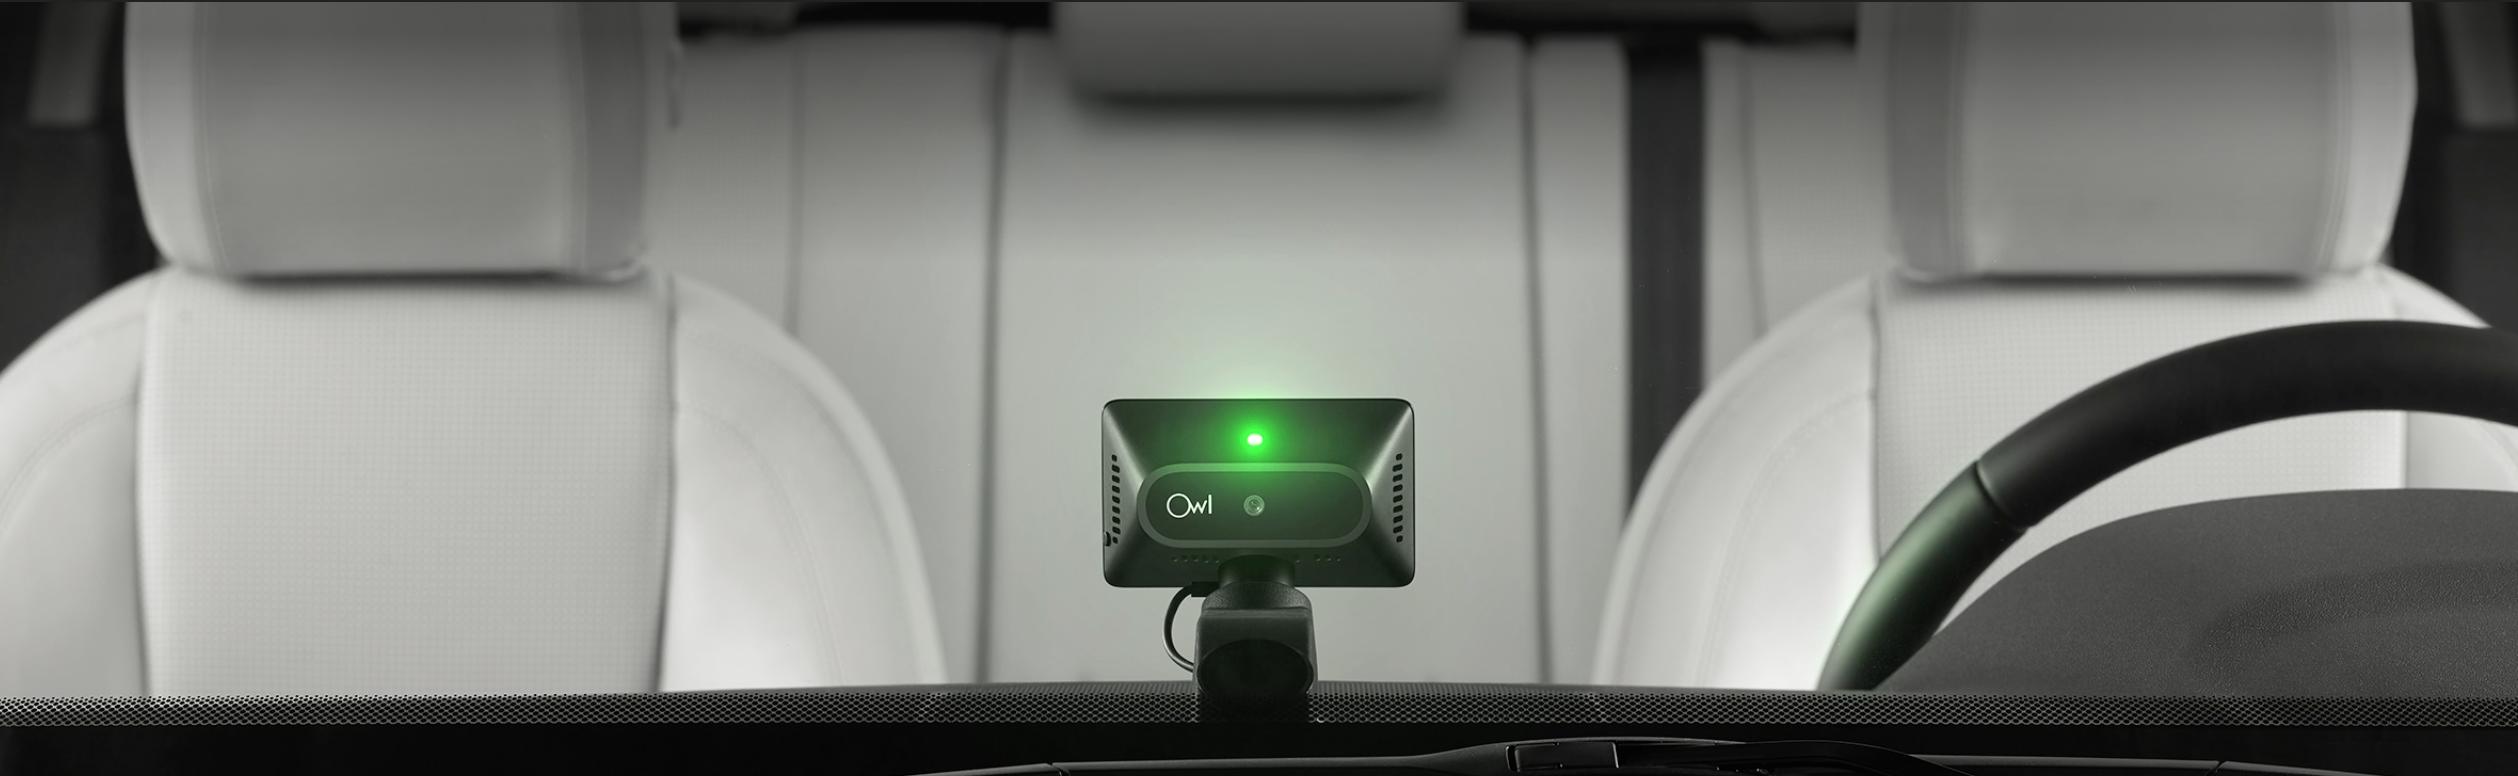 Owl Car Cam - Feature